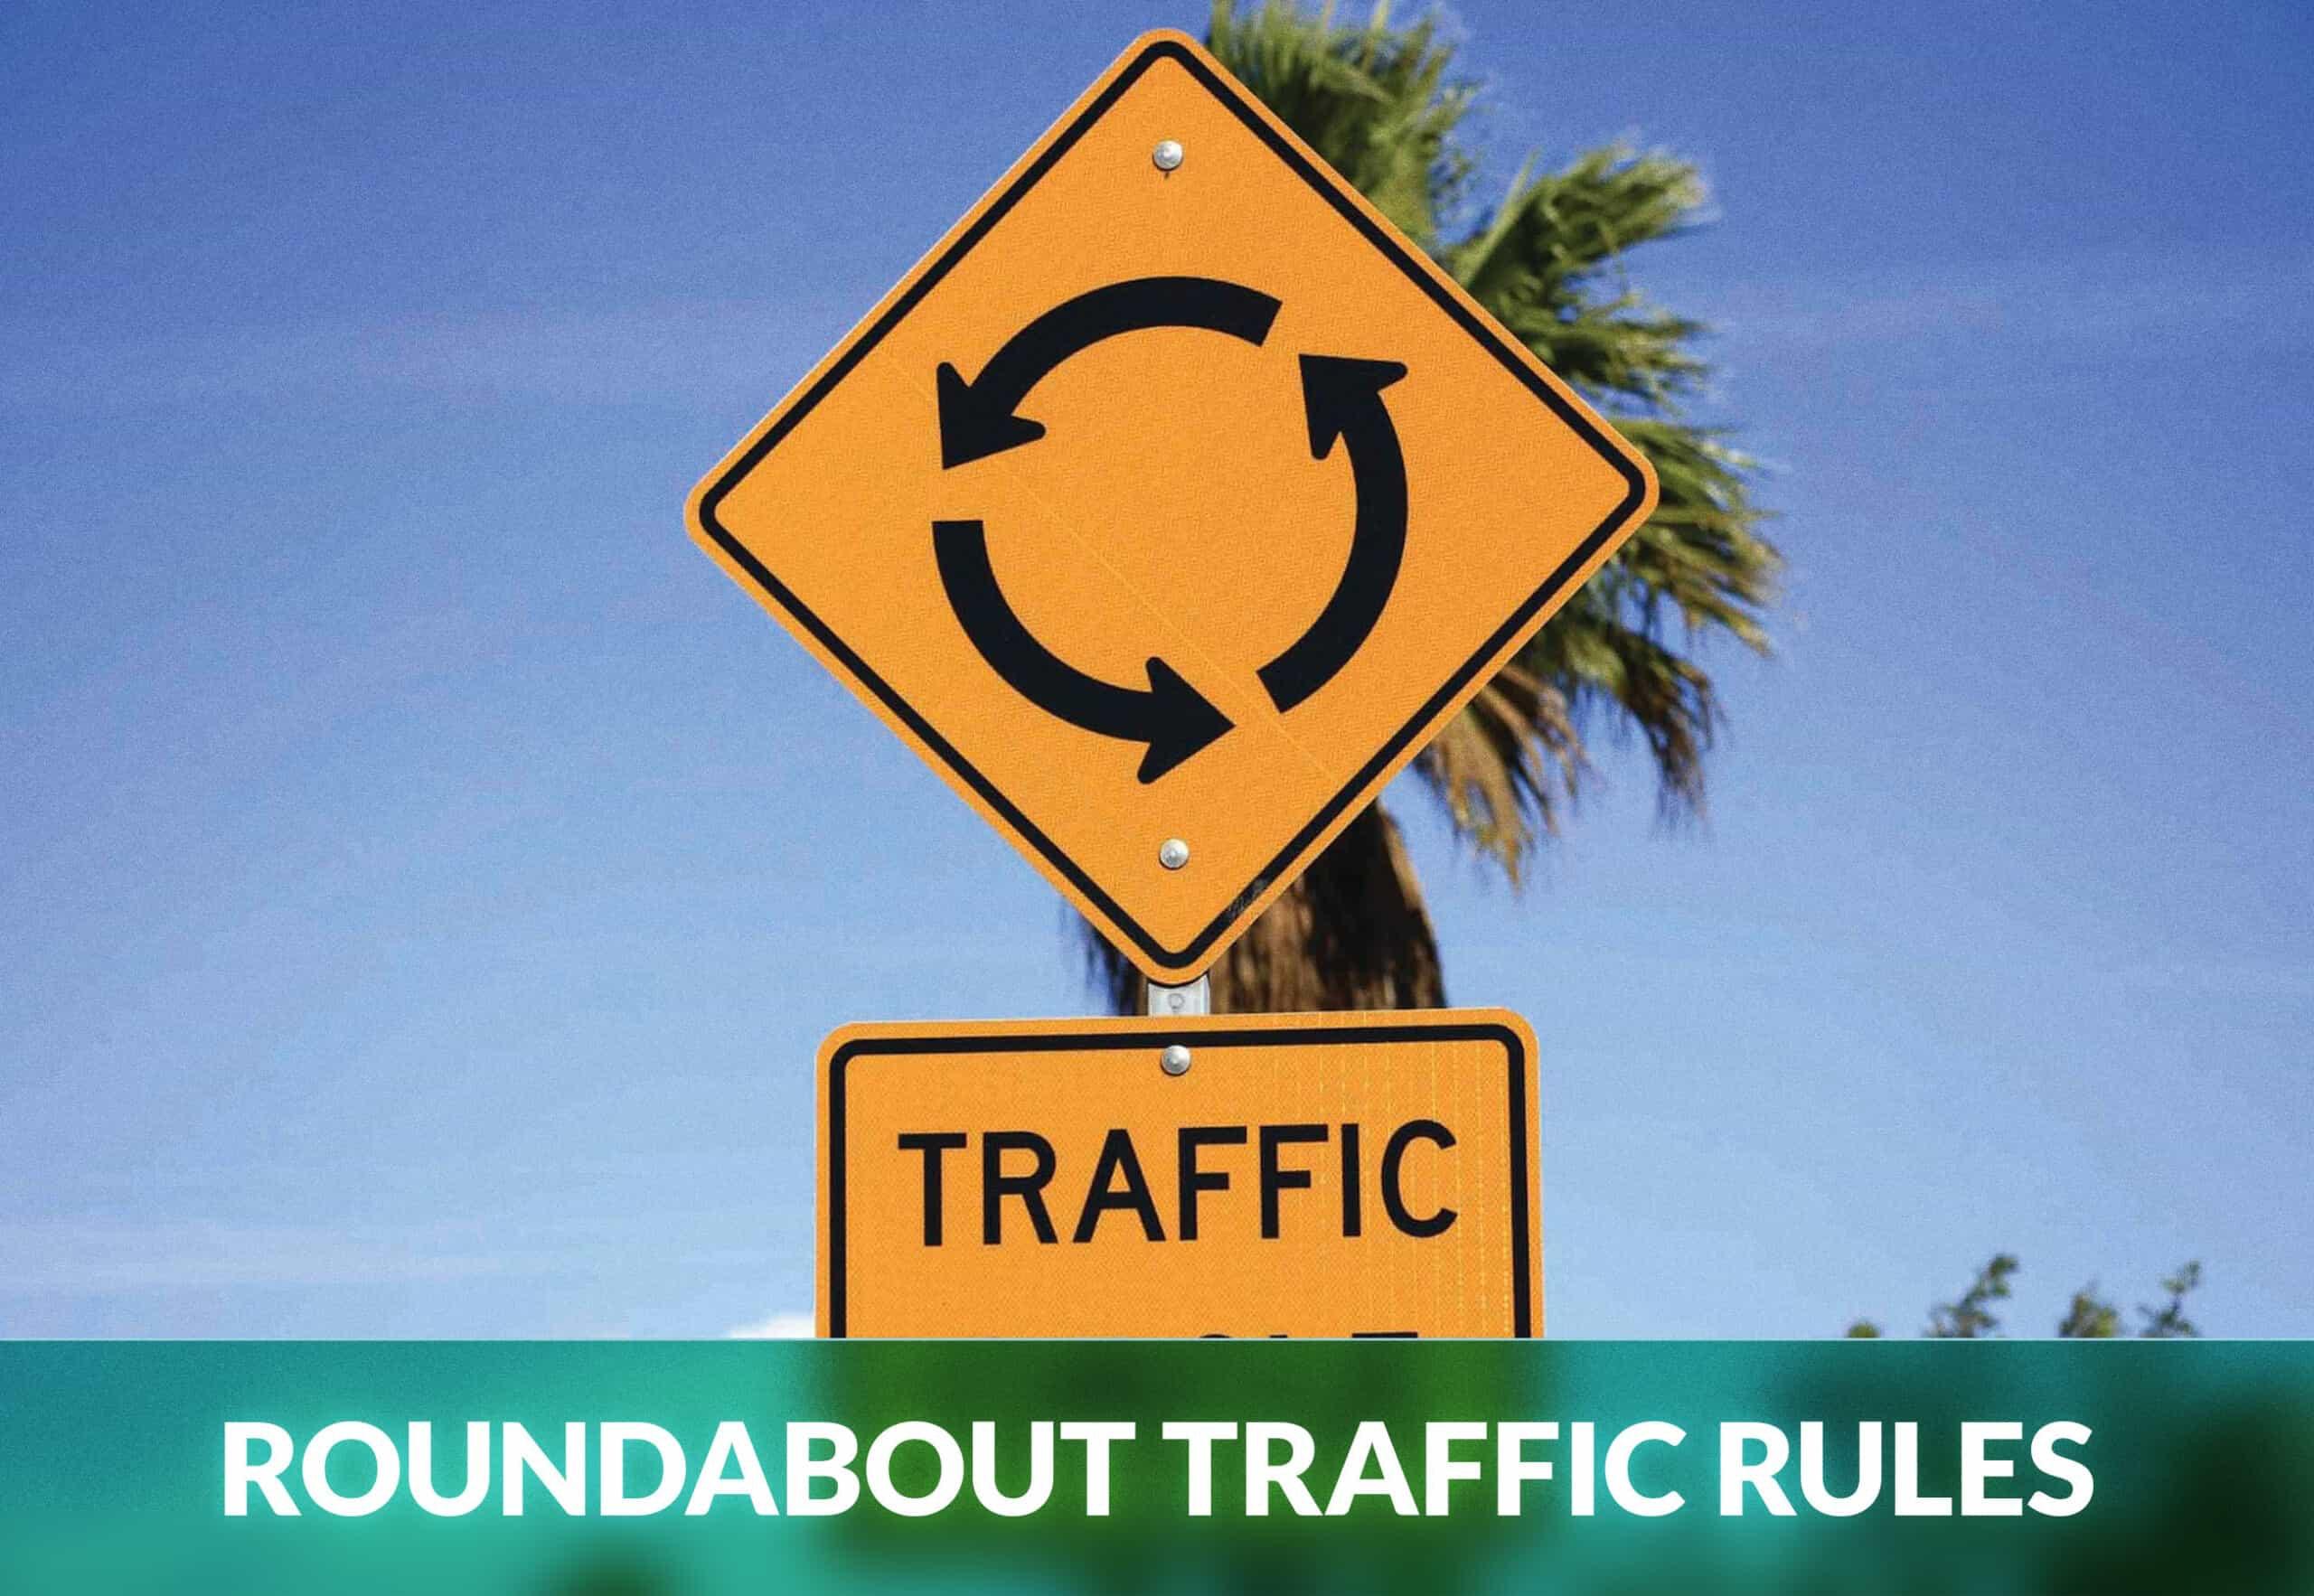 ROUNDABOUT TRAFFIC RULES